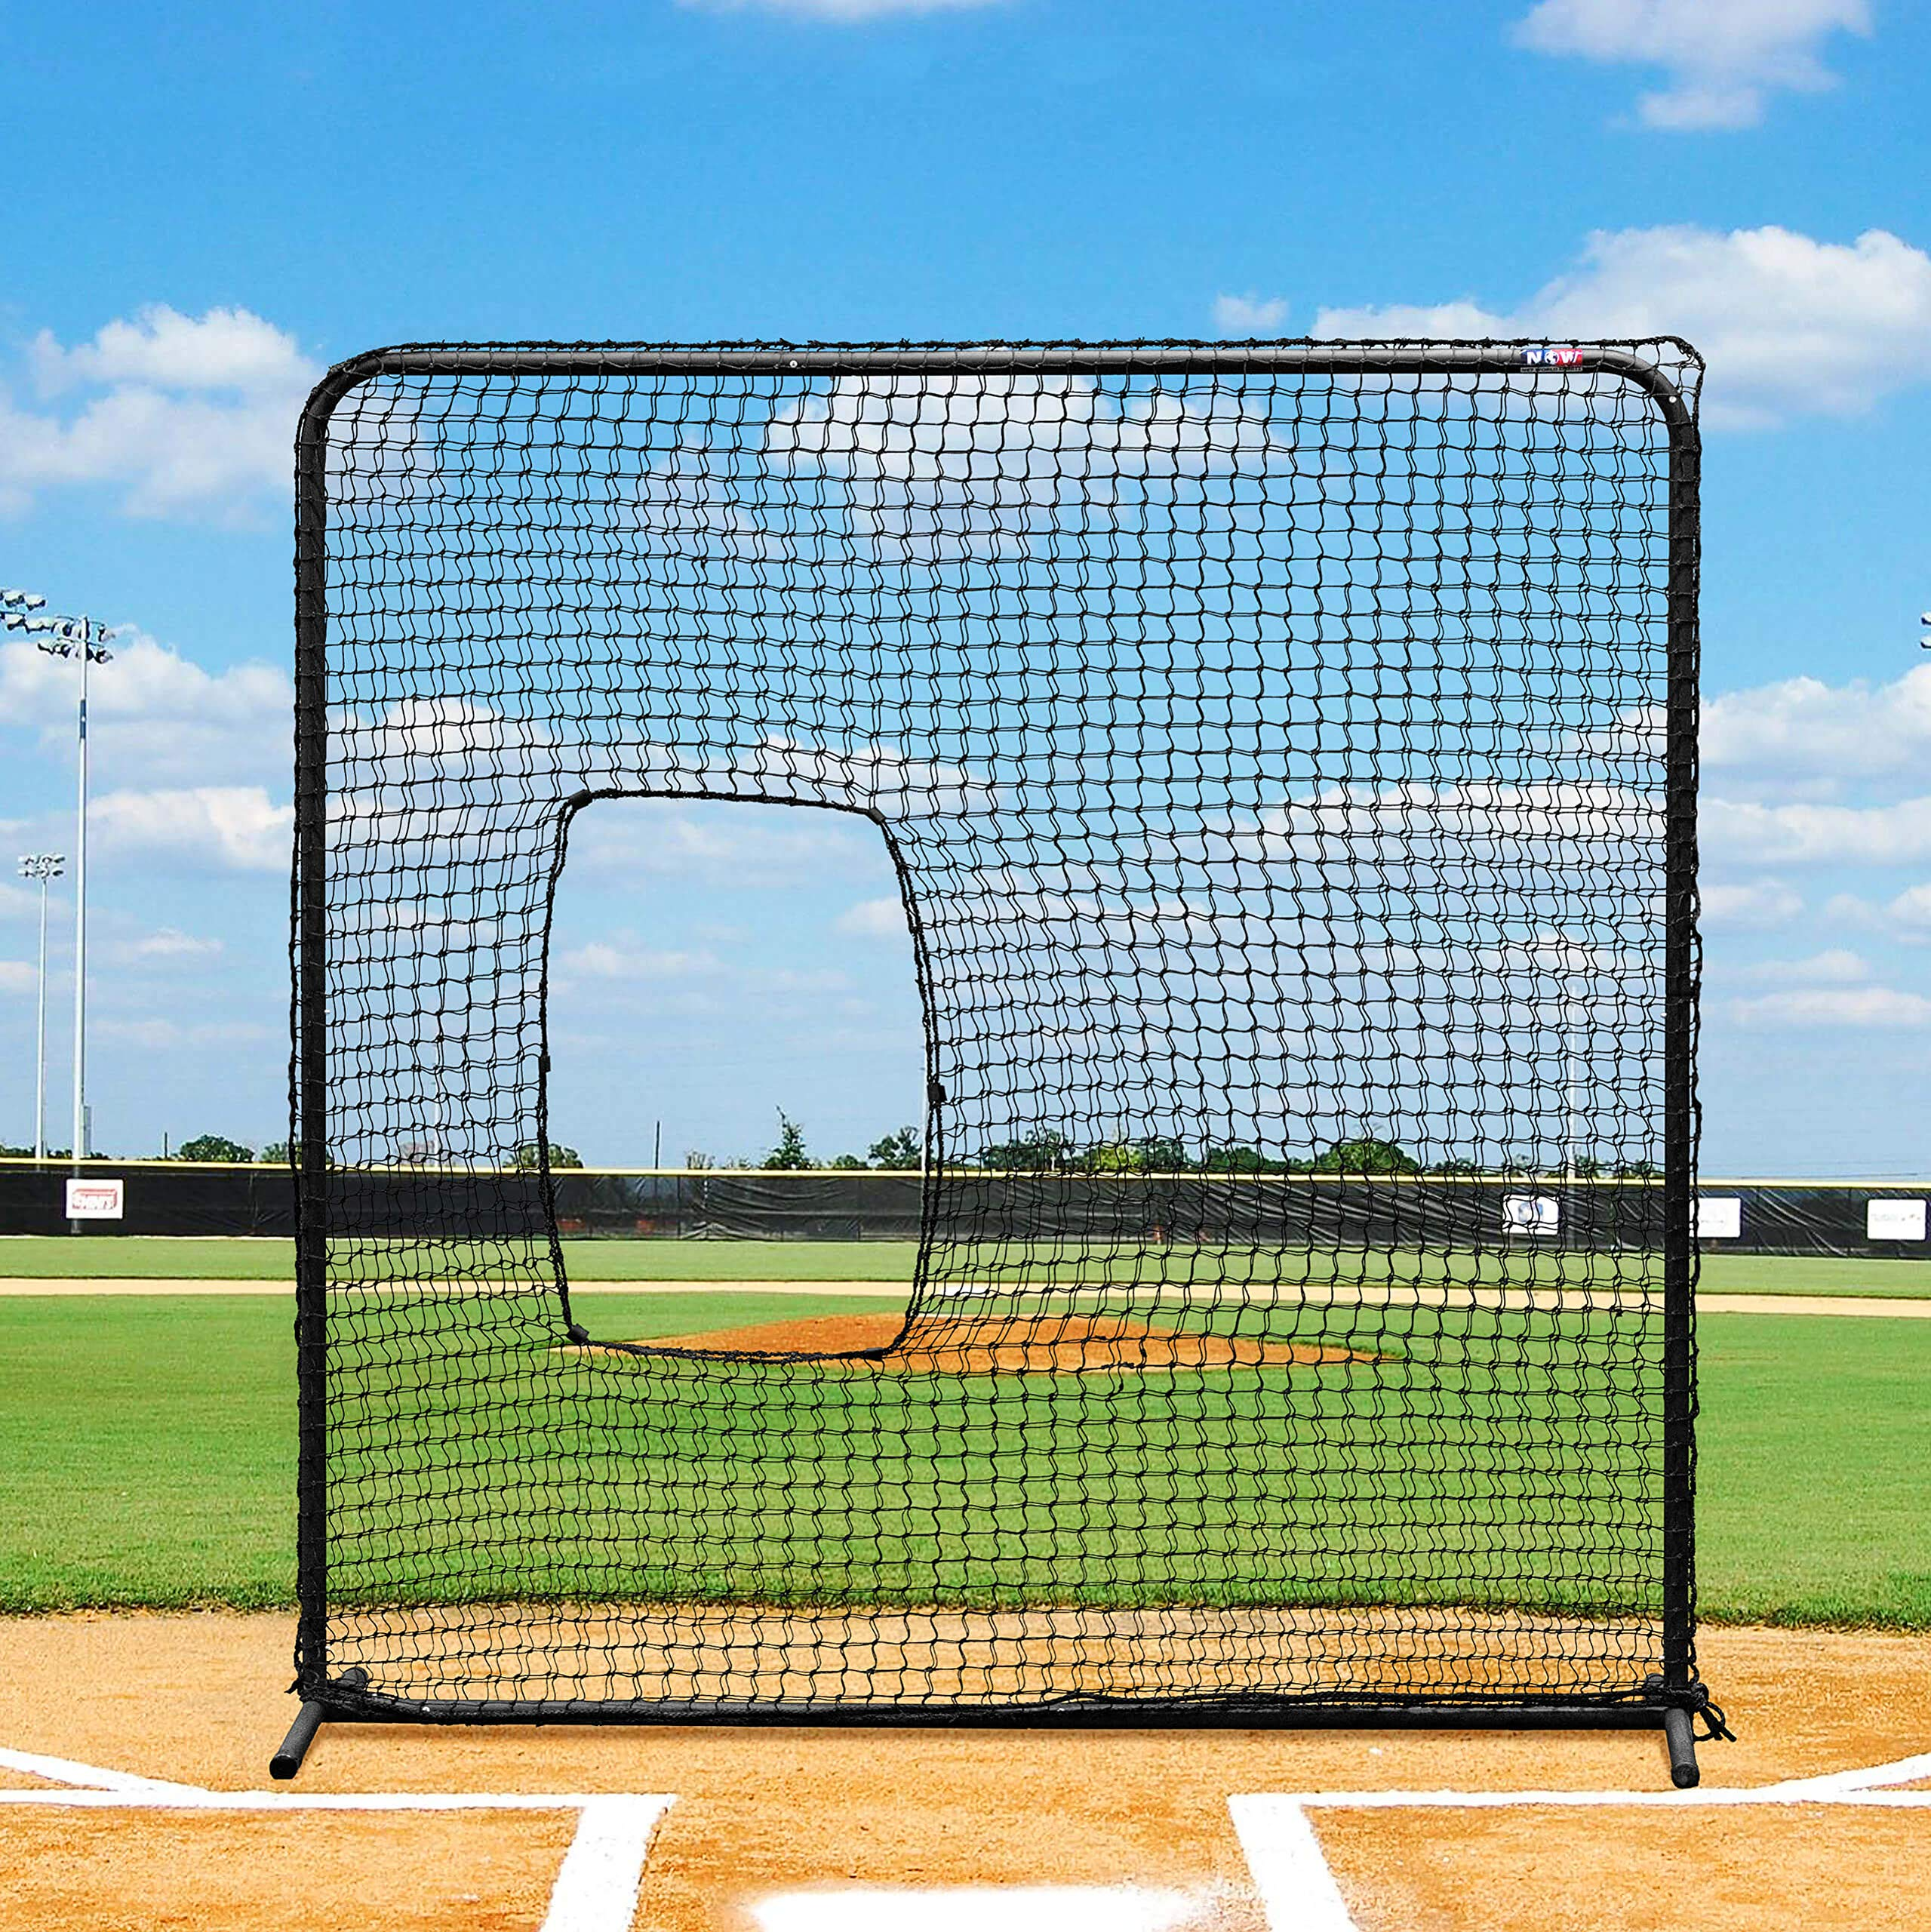 C-Shaped w//Pillow Case Design TACVPI Softball Pitchers Protector